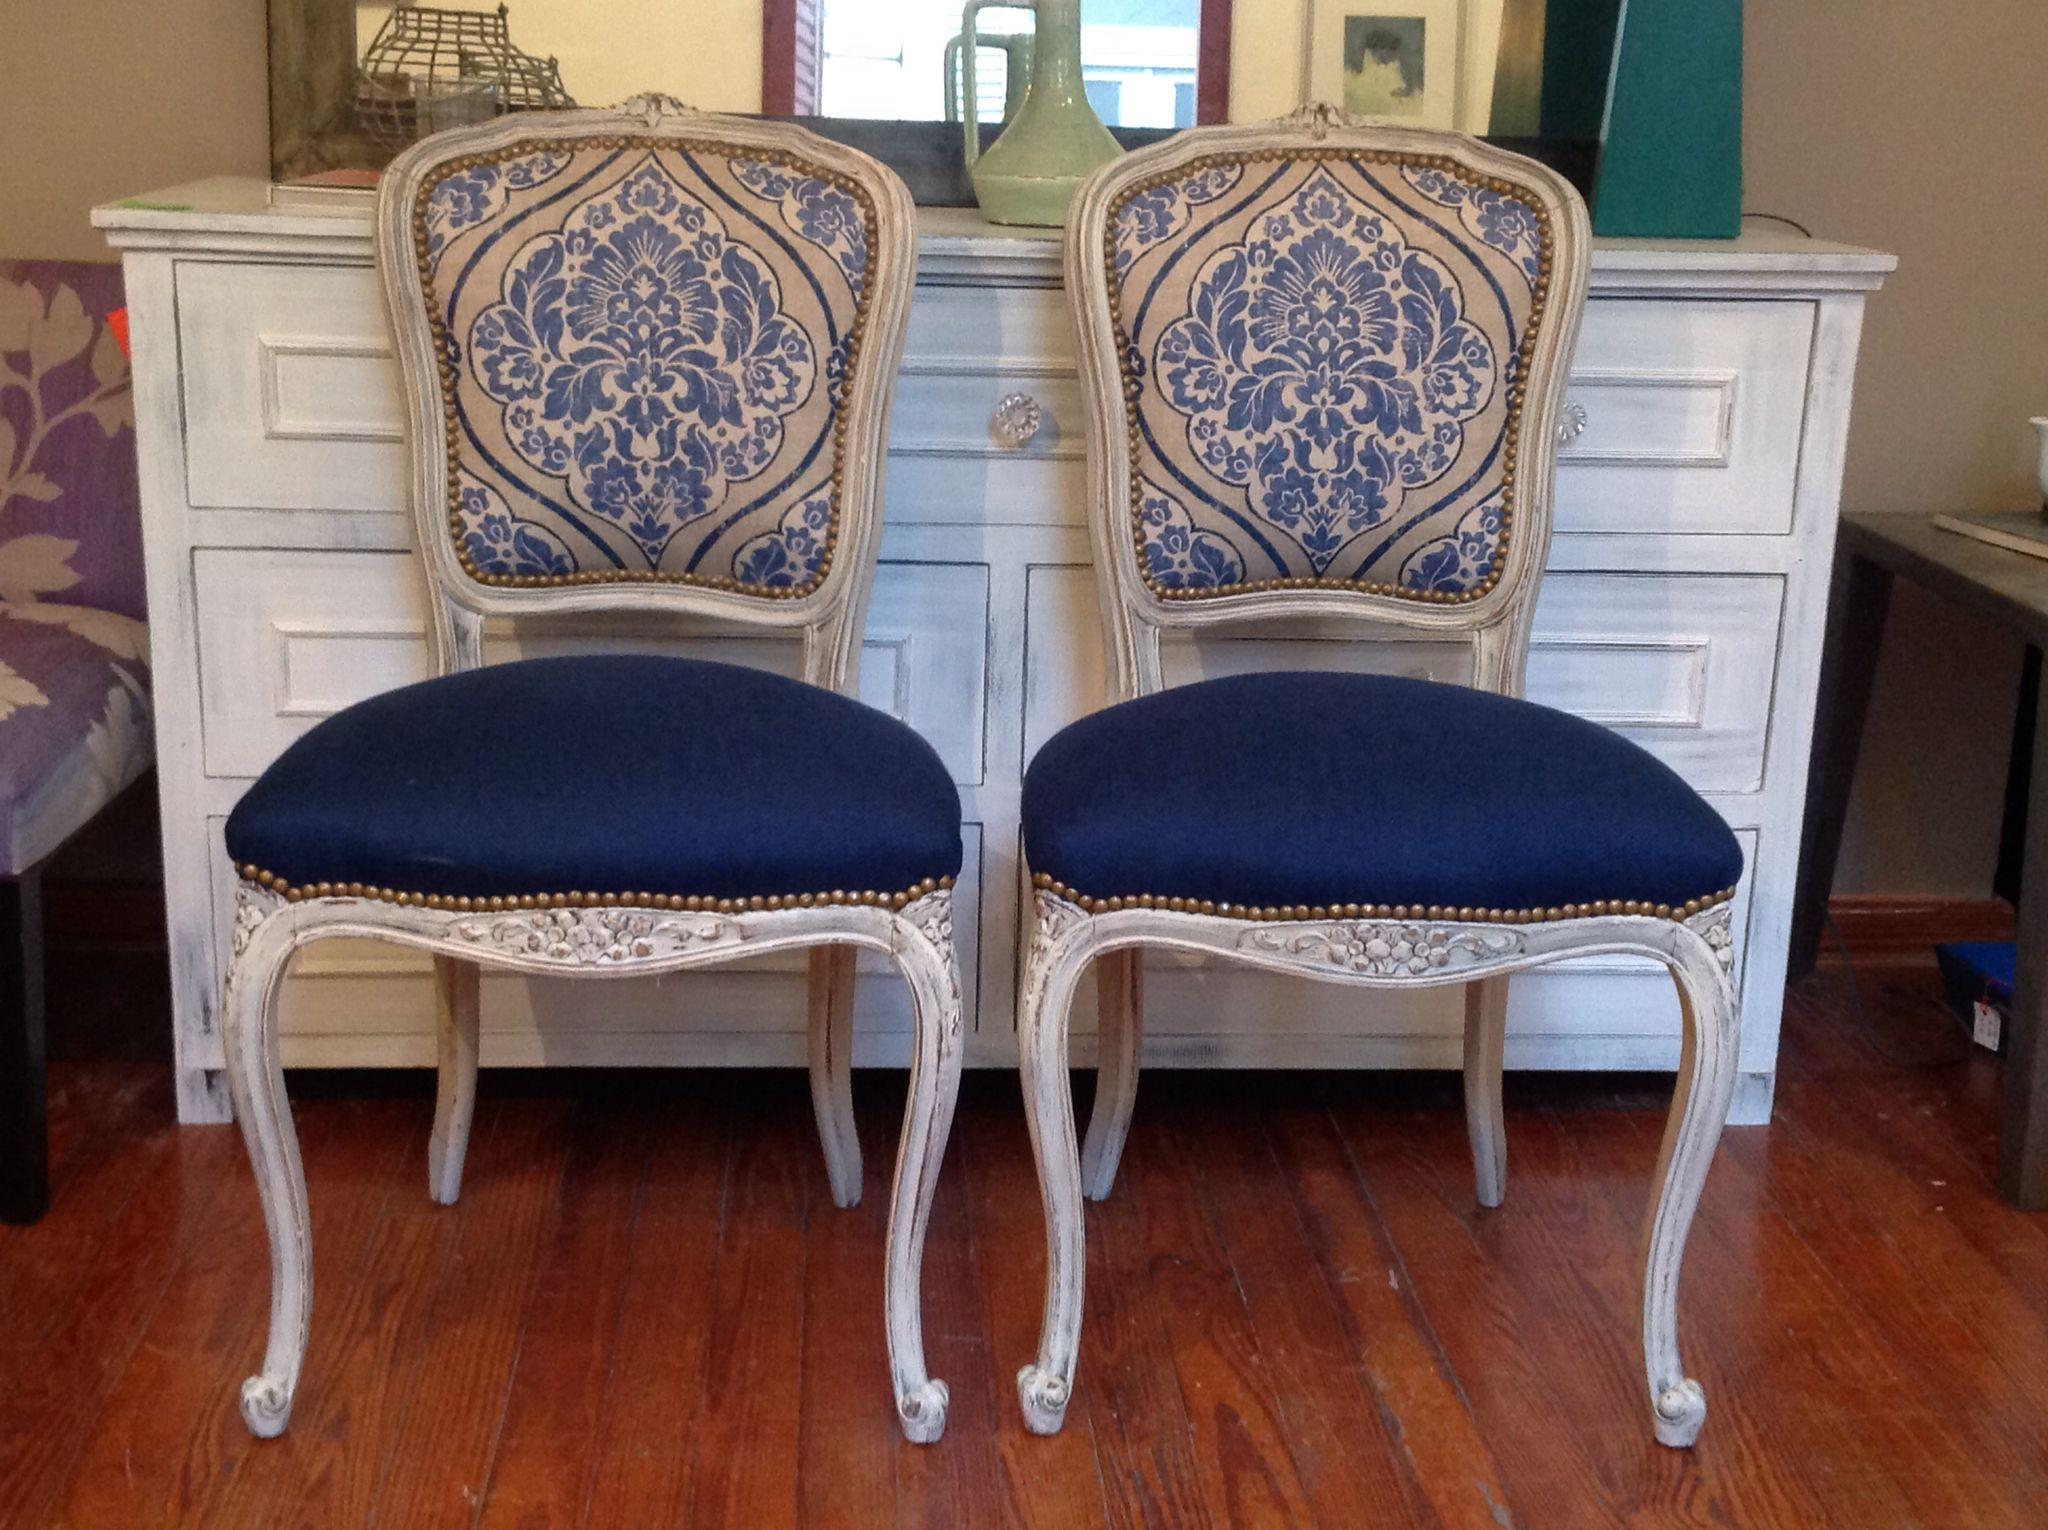 Sillas antiguas | tapiceria sillas en 2019 | Sillas francesas ...